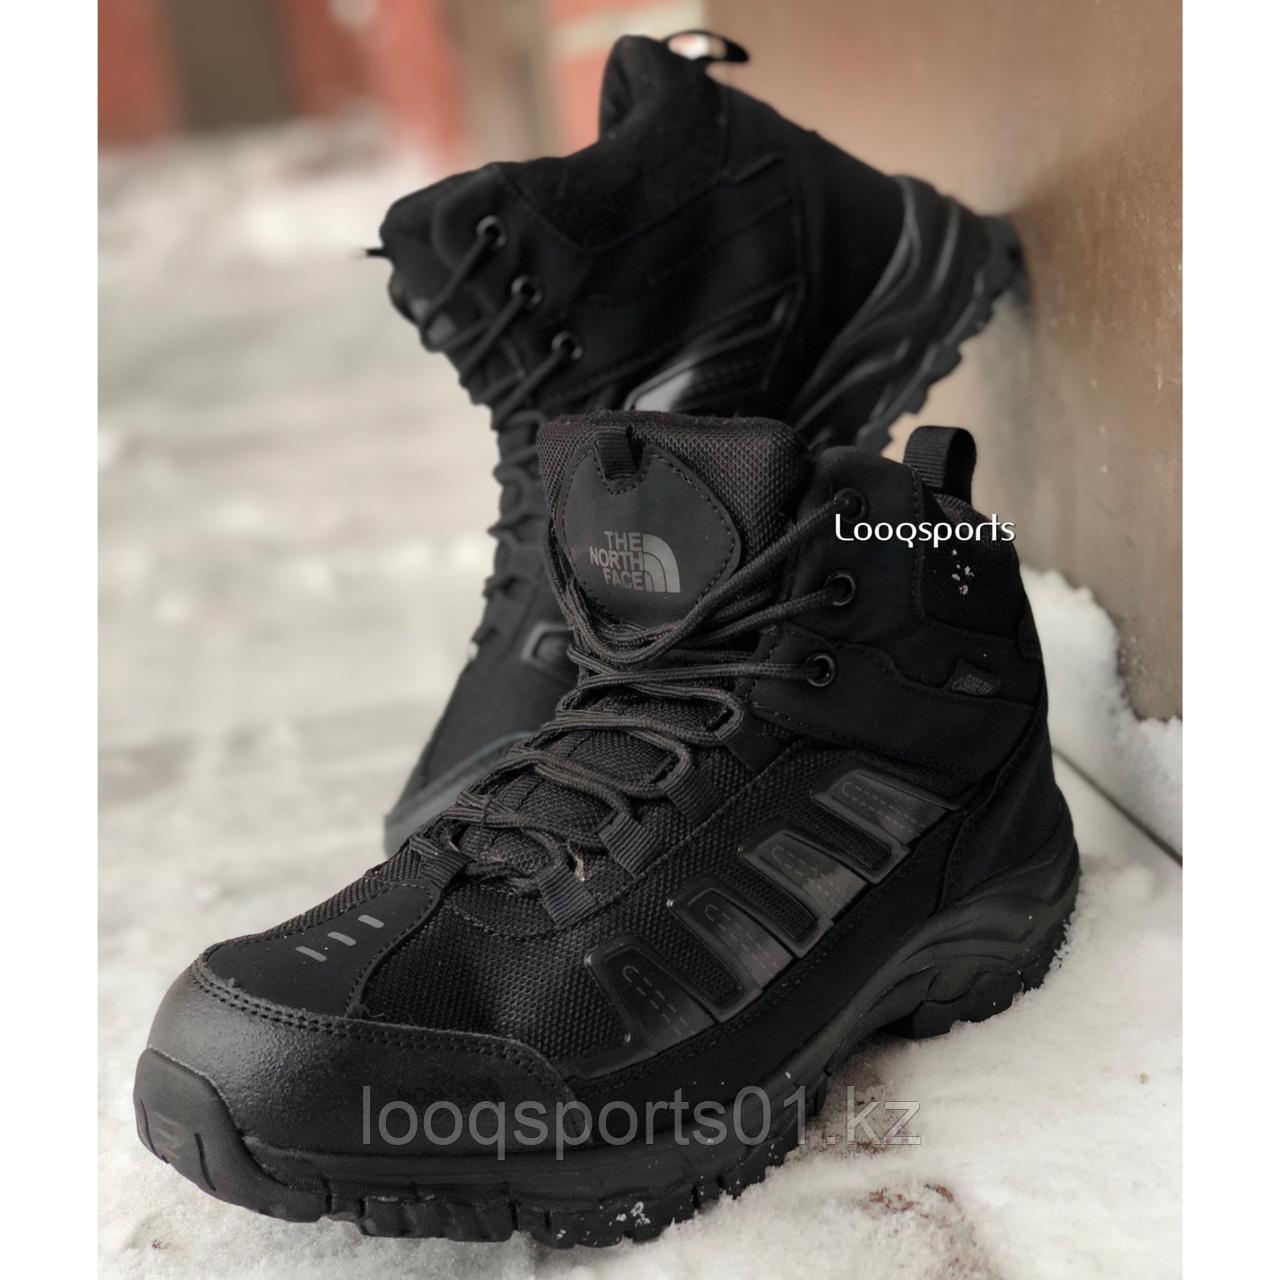 Зимние ботинки TheNorthFace 1703-1